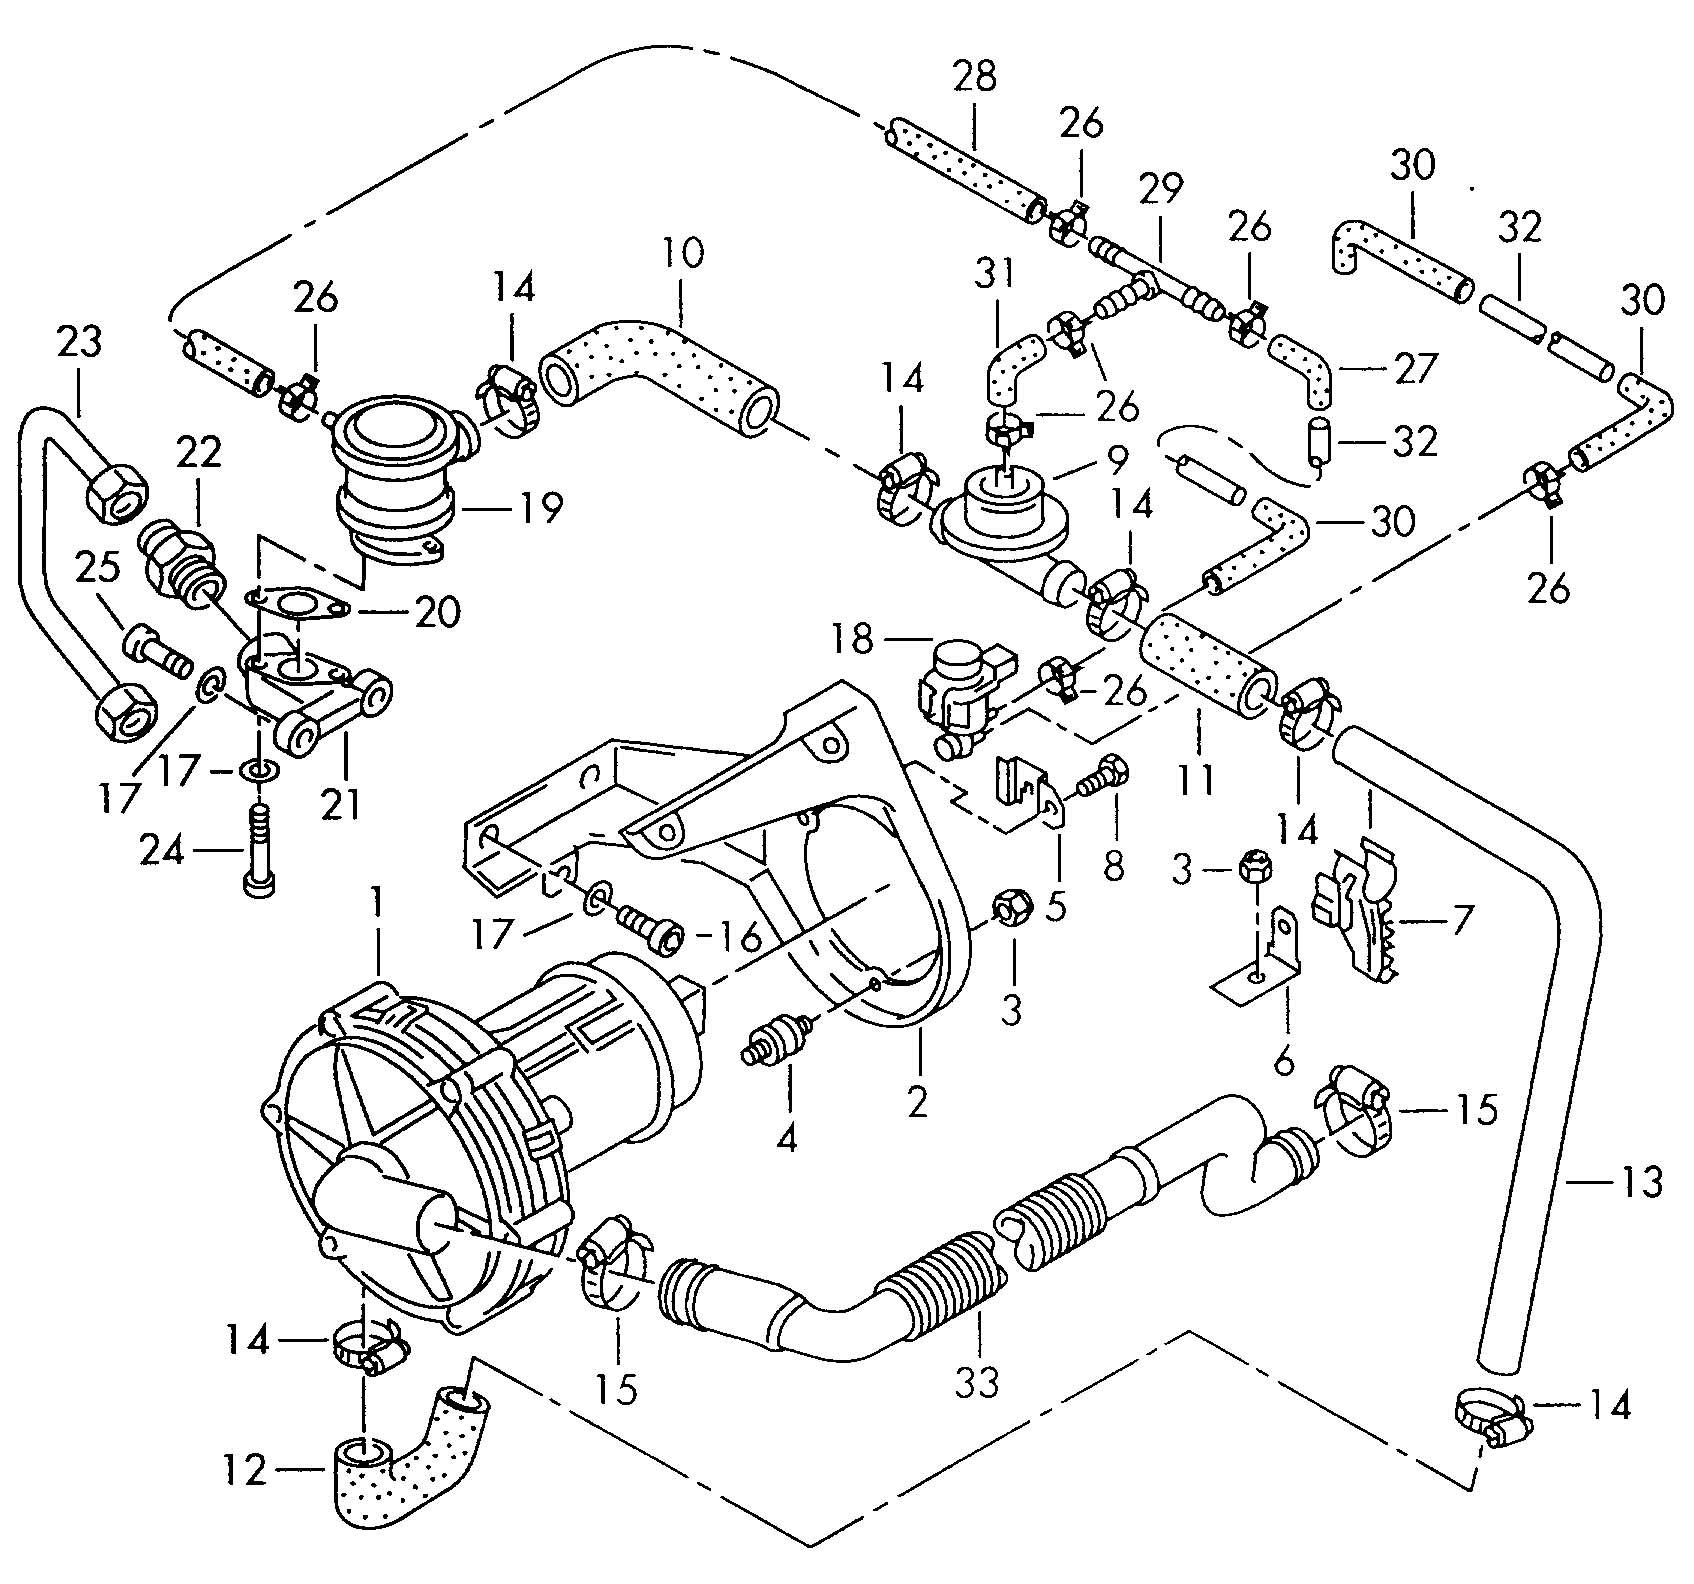 vw cabrio 2.0 engine diagram